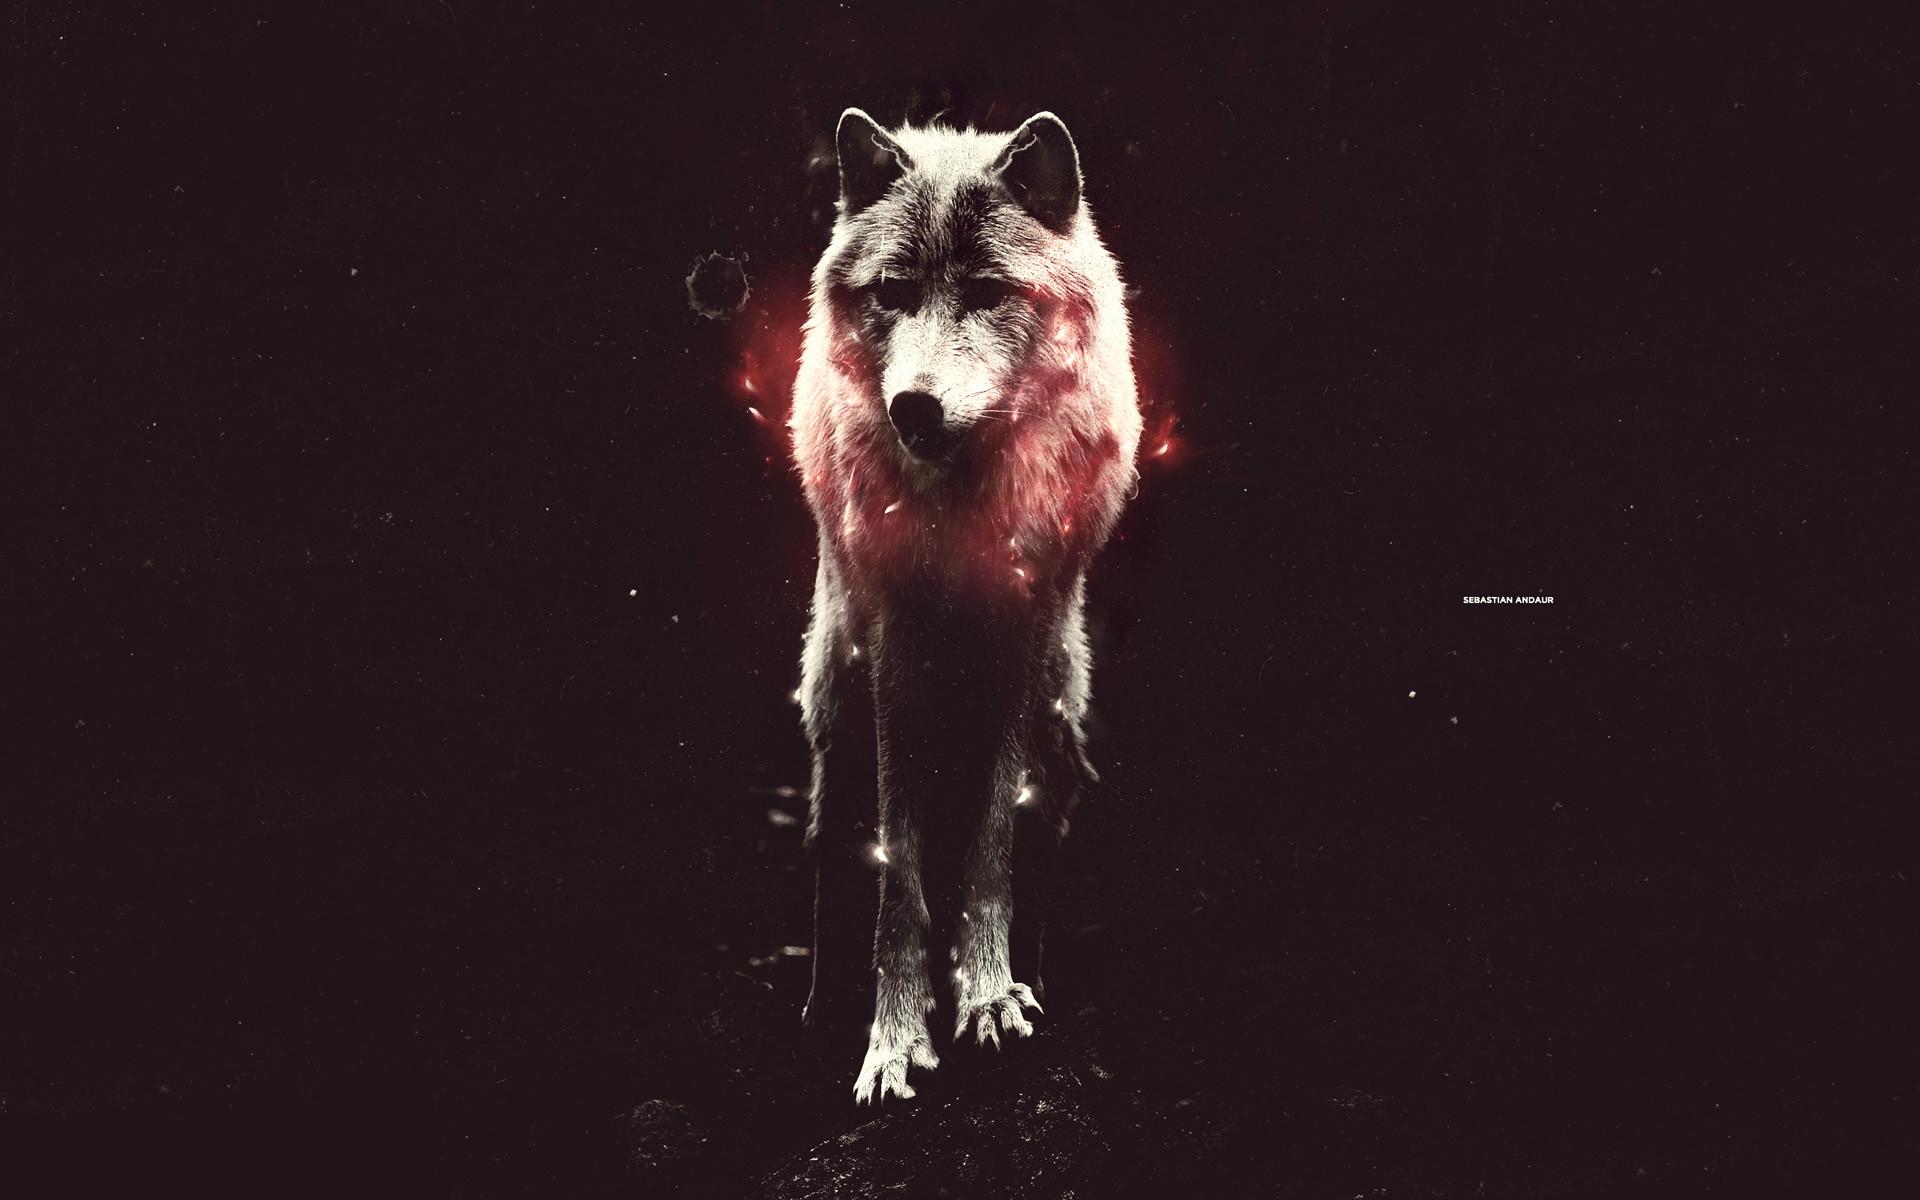 wallpaper, hipster, animal, shotamagica, wolf, color